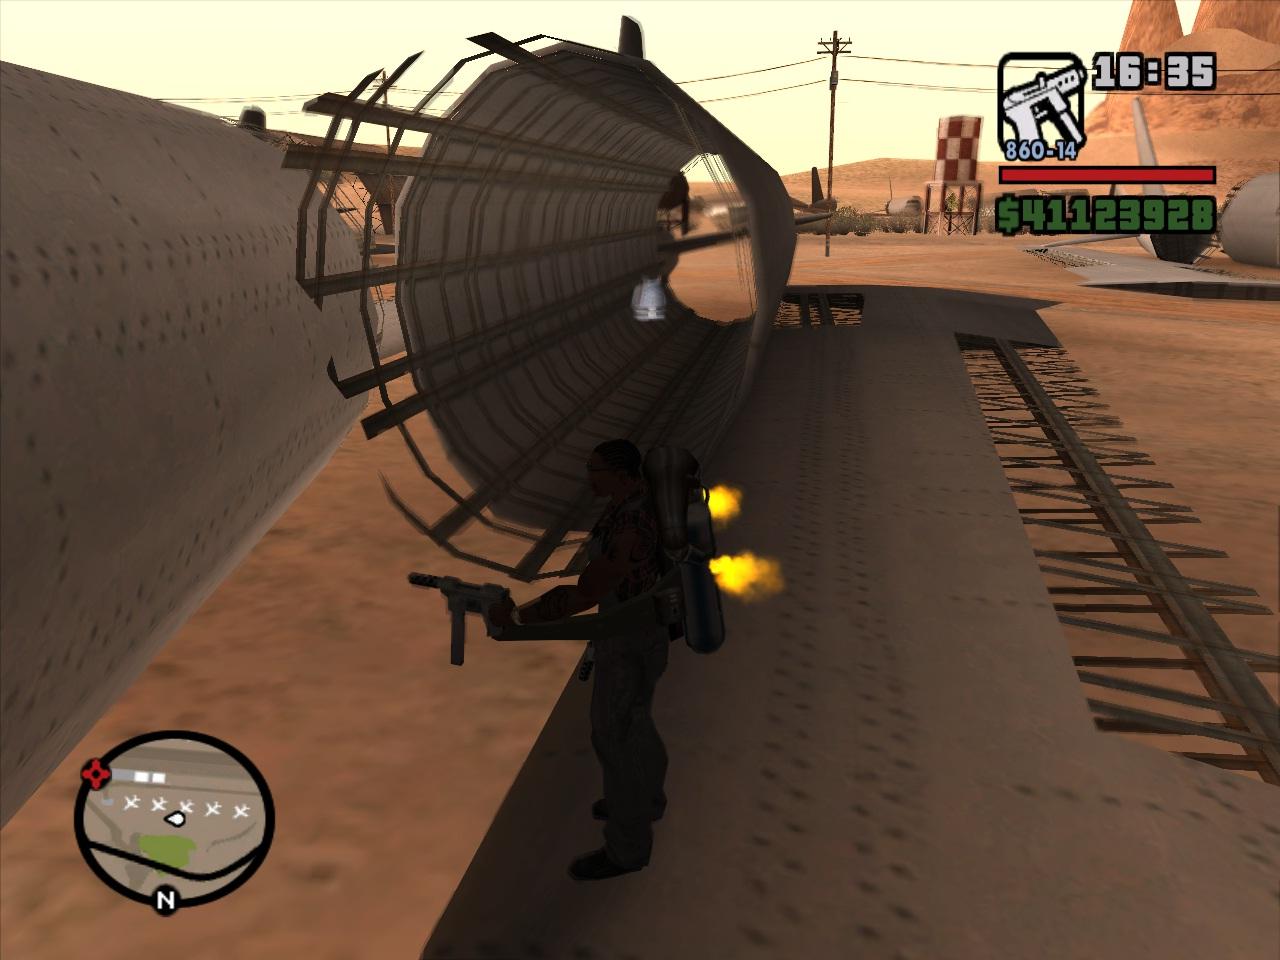 Броник - Grand Theft Auto: San Andreas